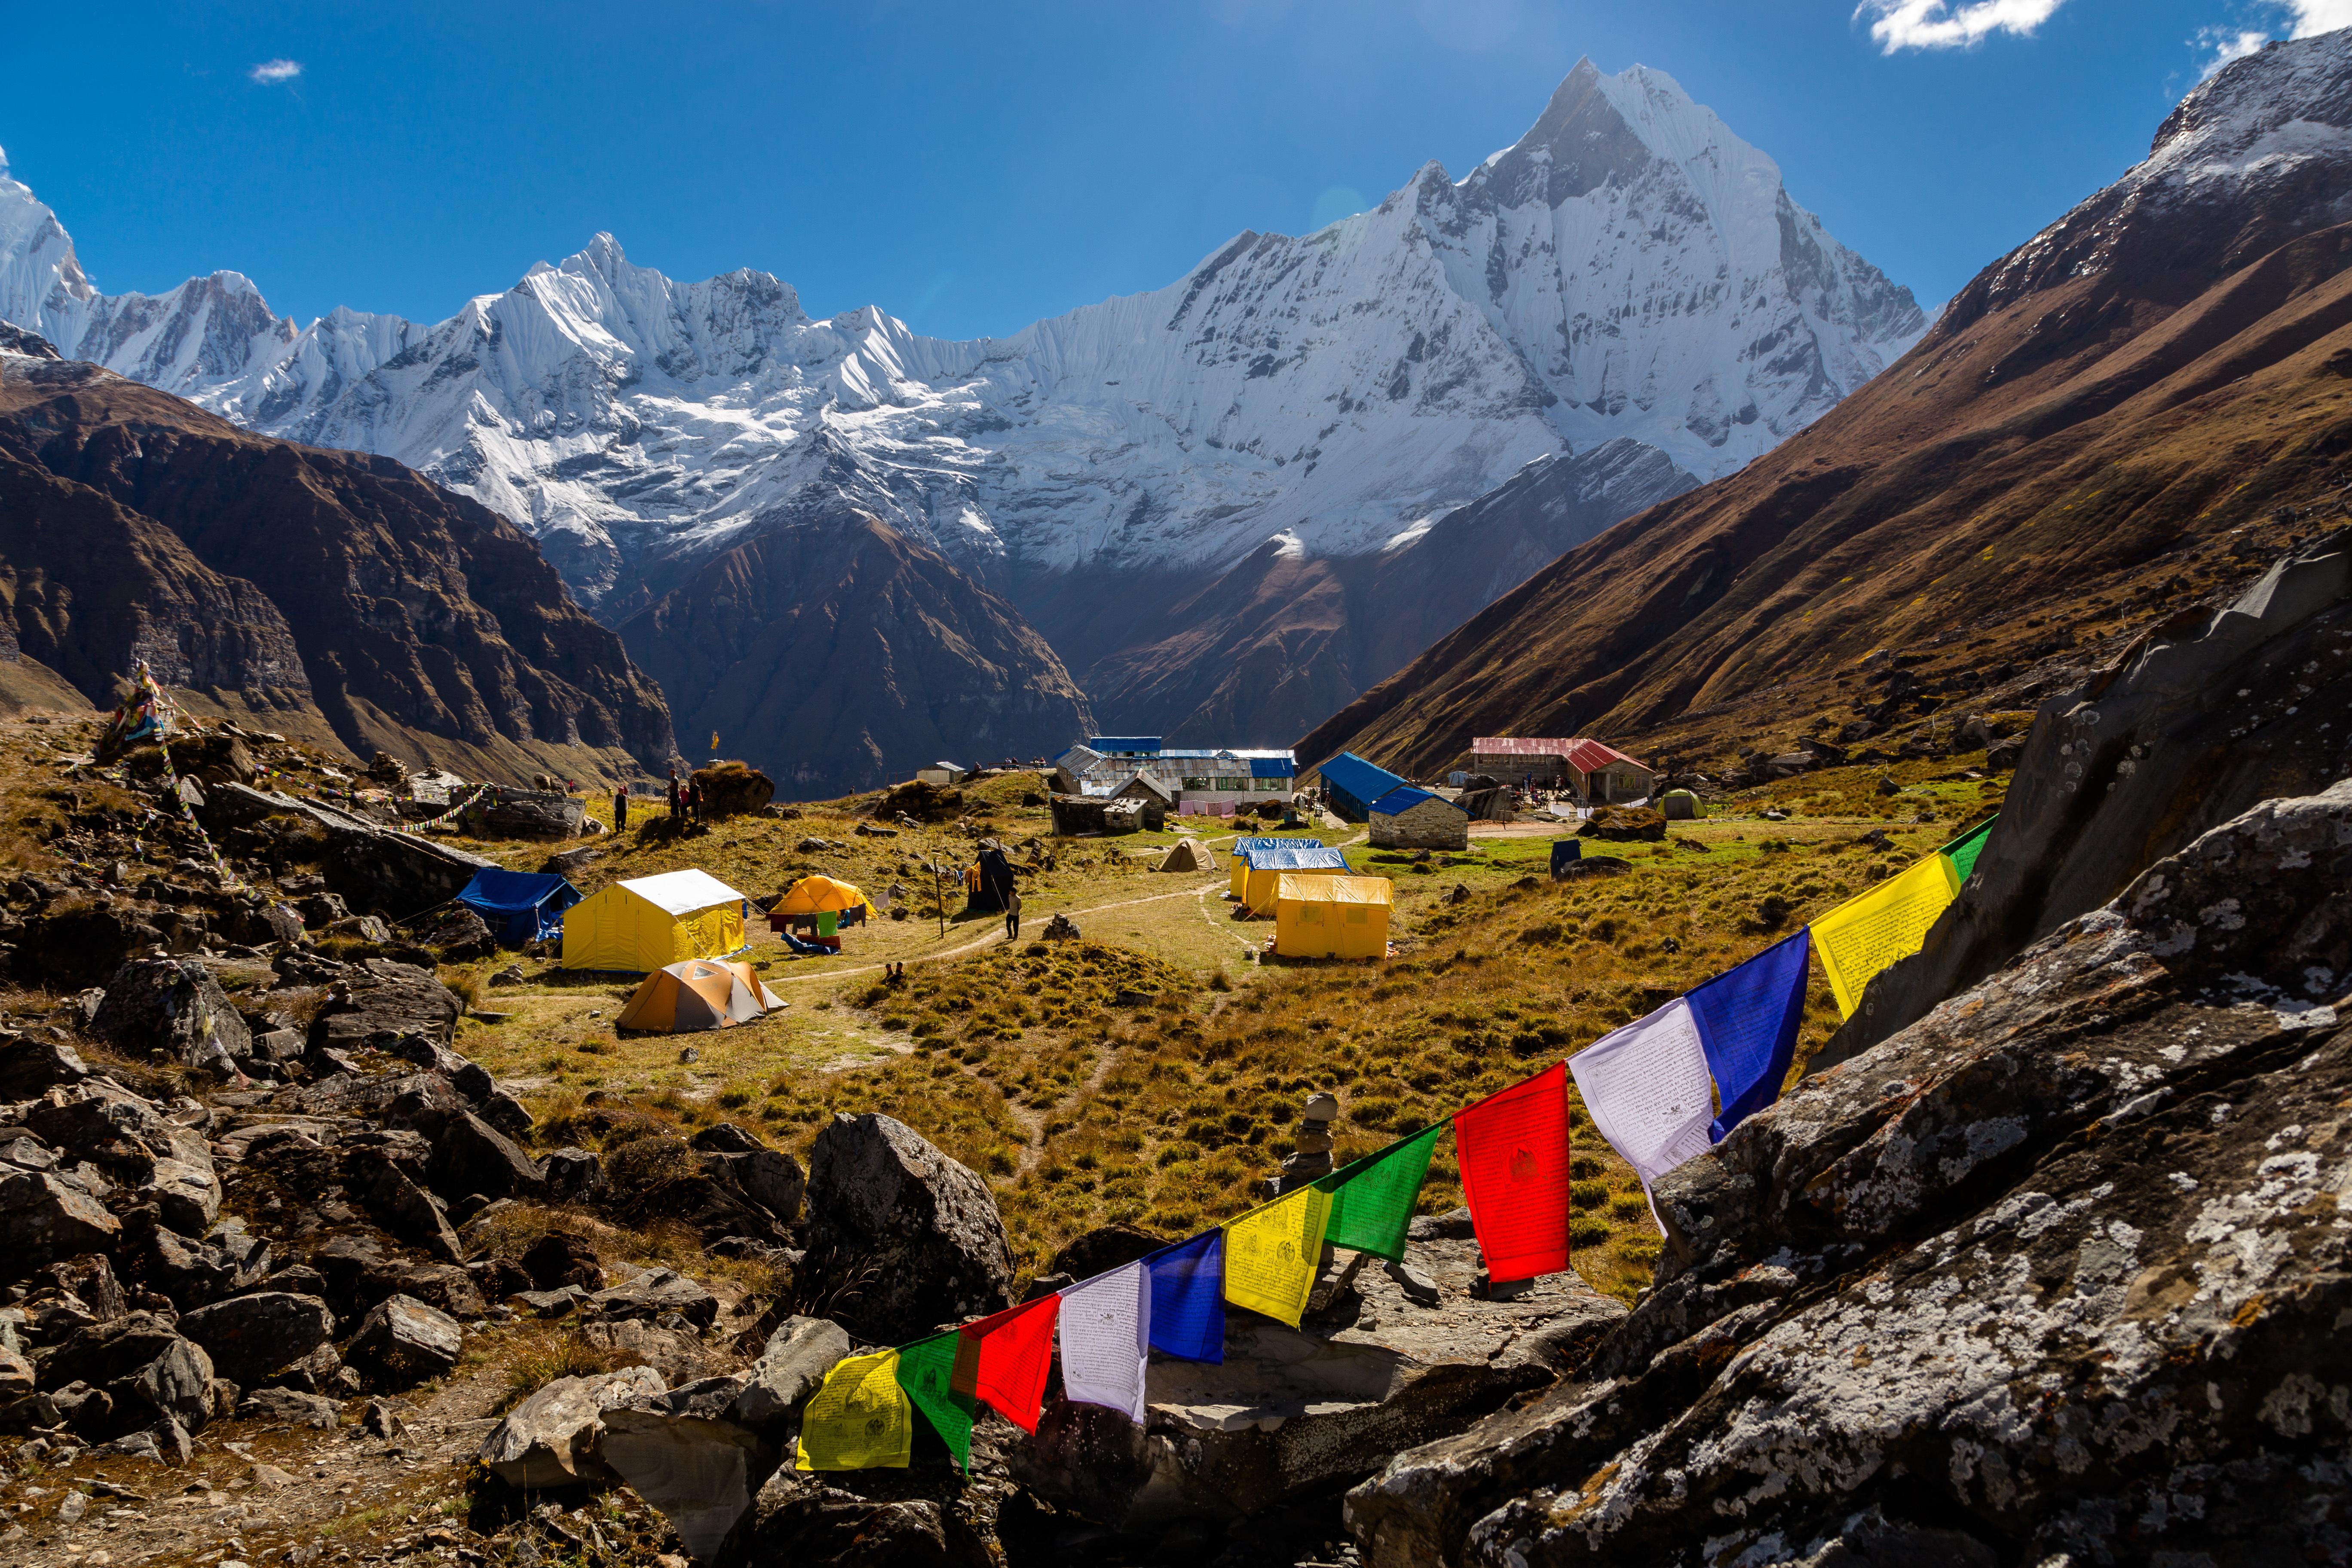 Pure Exploration: Adventure Guide Program – Nepal